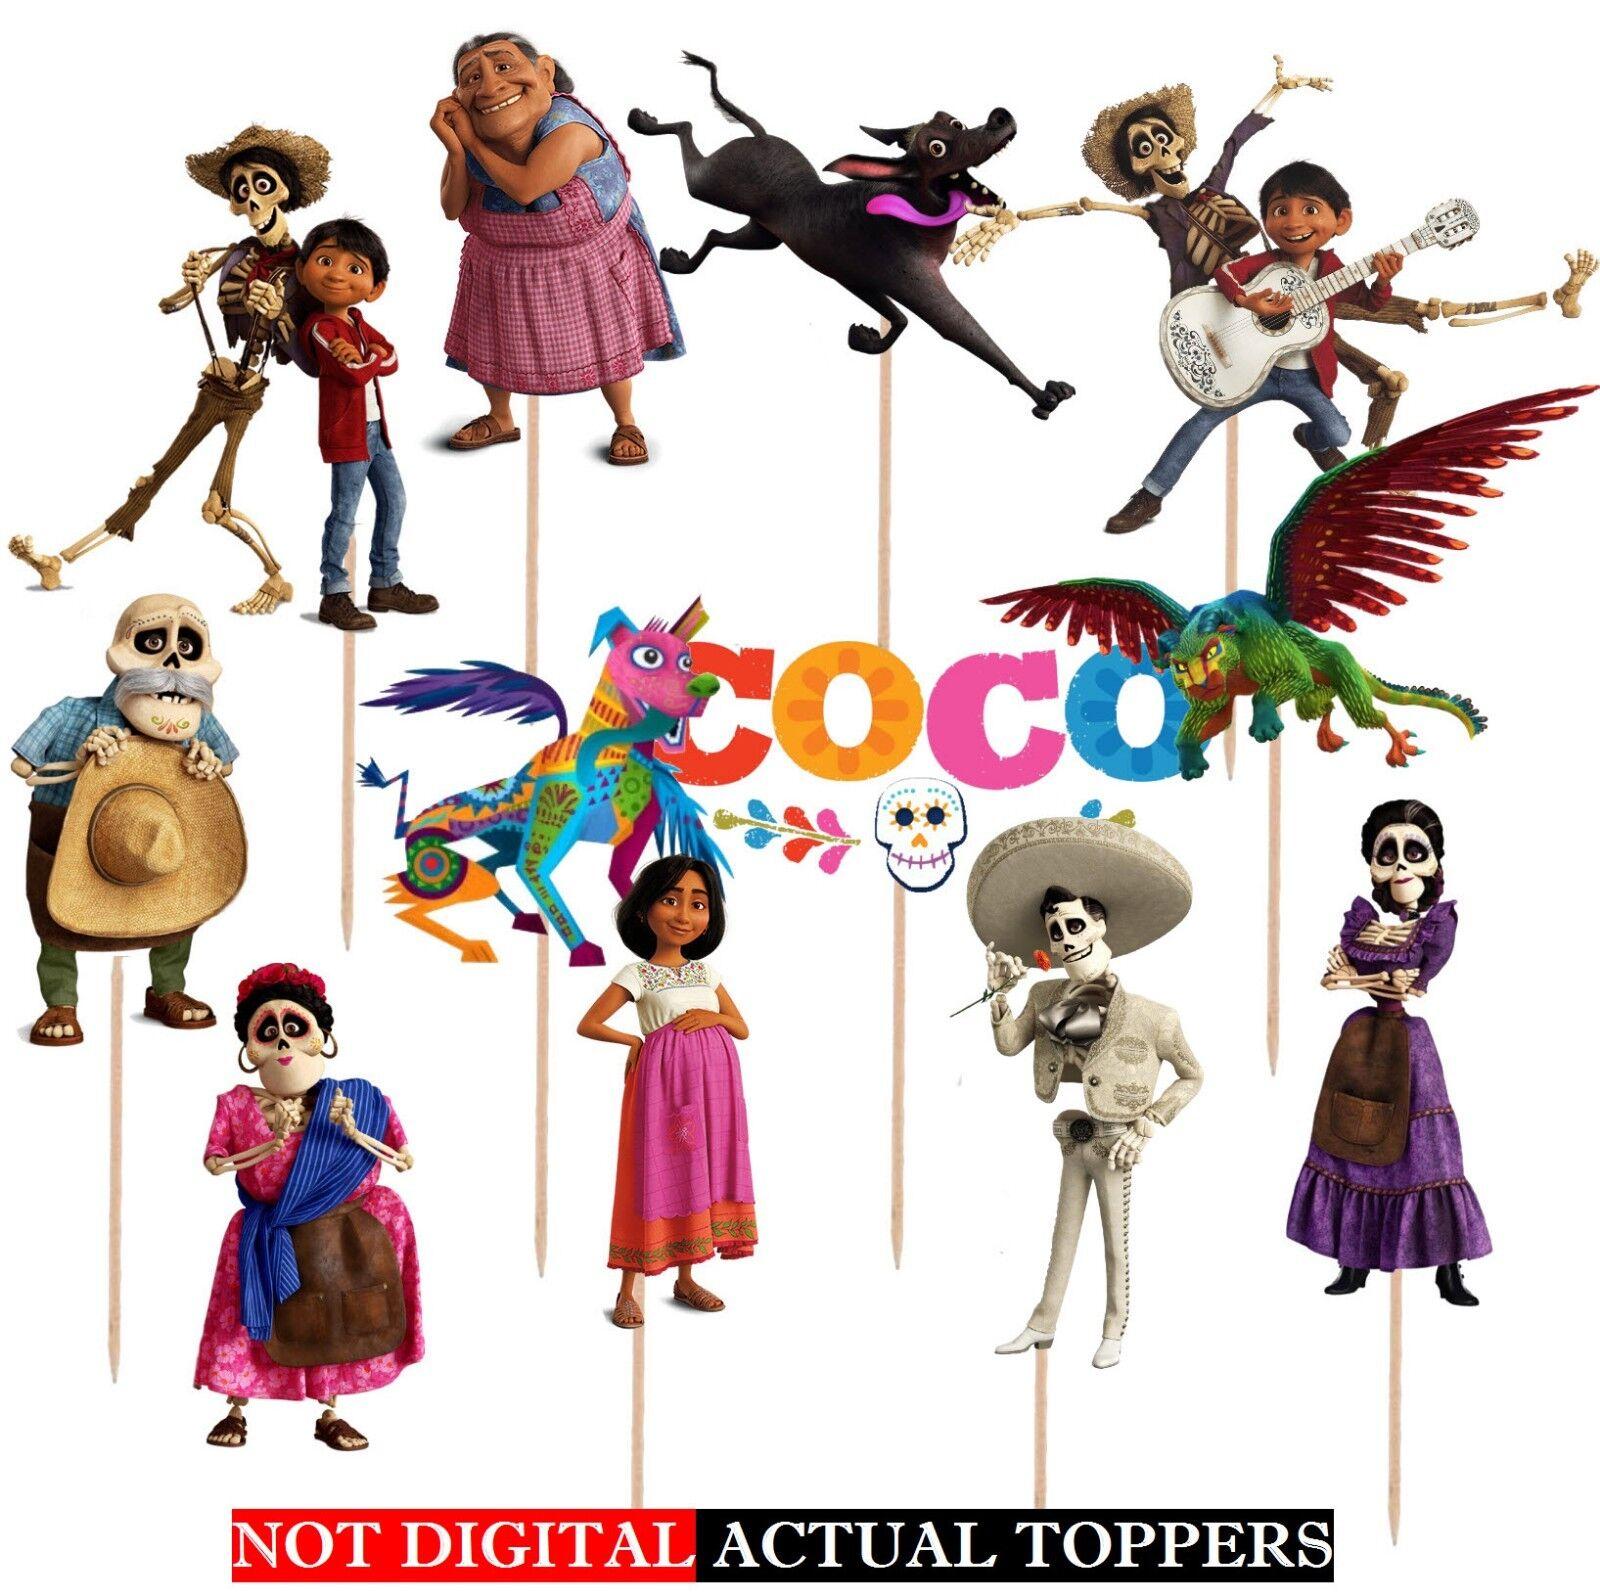 как выглядит Воздушный шар для праздника или вечеринки COCO CUPCAKE TOPPERS CUP CAKE TOPPER Birthday Party Supplies BALLOON DECORATION фото